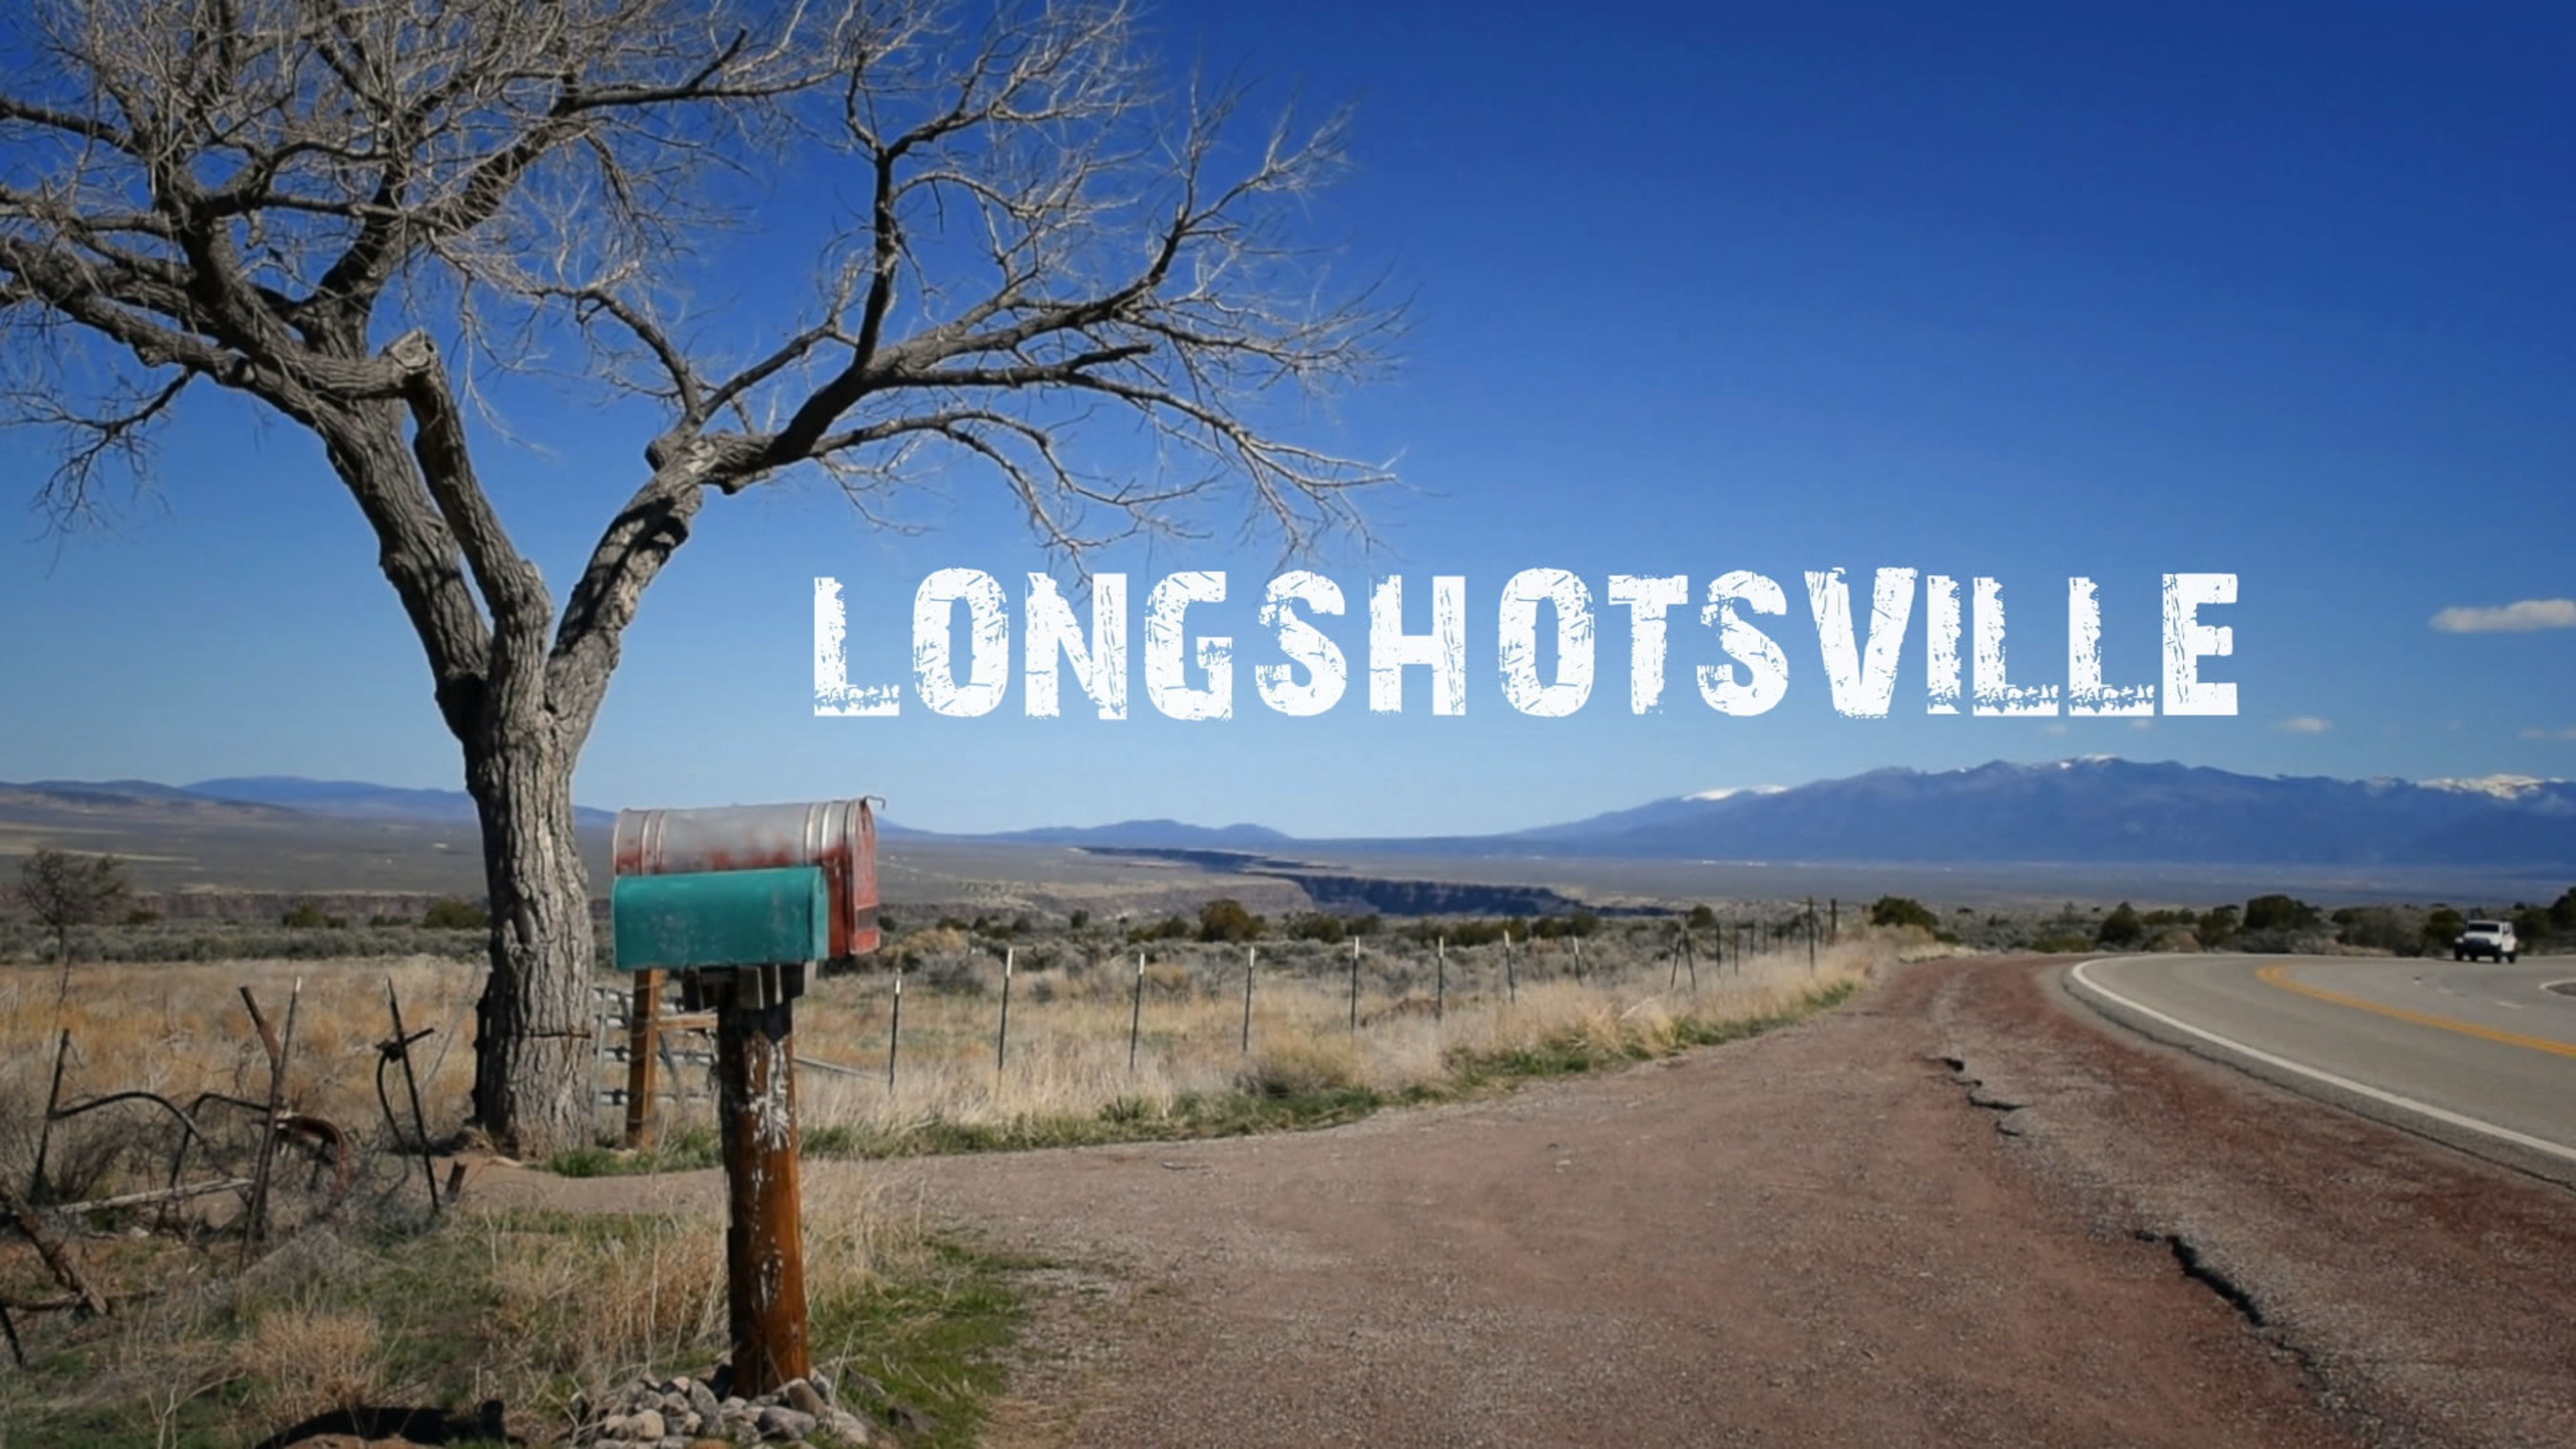 Santa Fe University of Art & Design Film Student to Show Longshotsville at Santa Fe Independent Film Festival